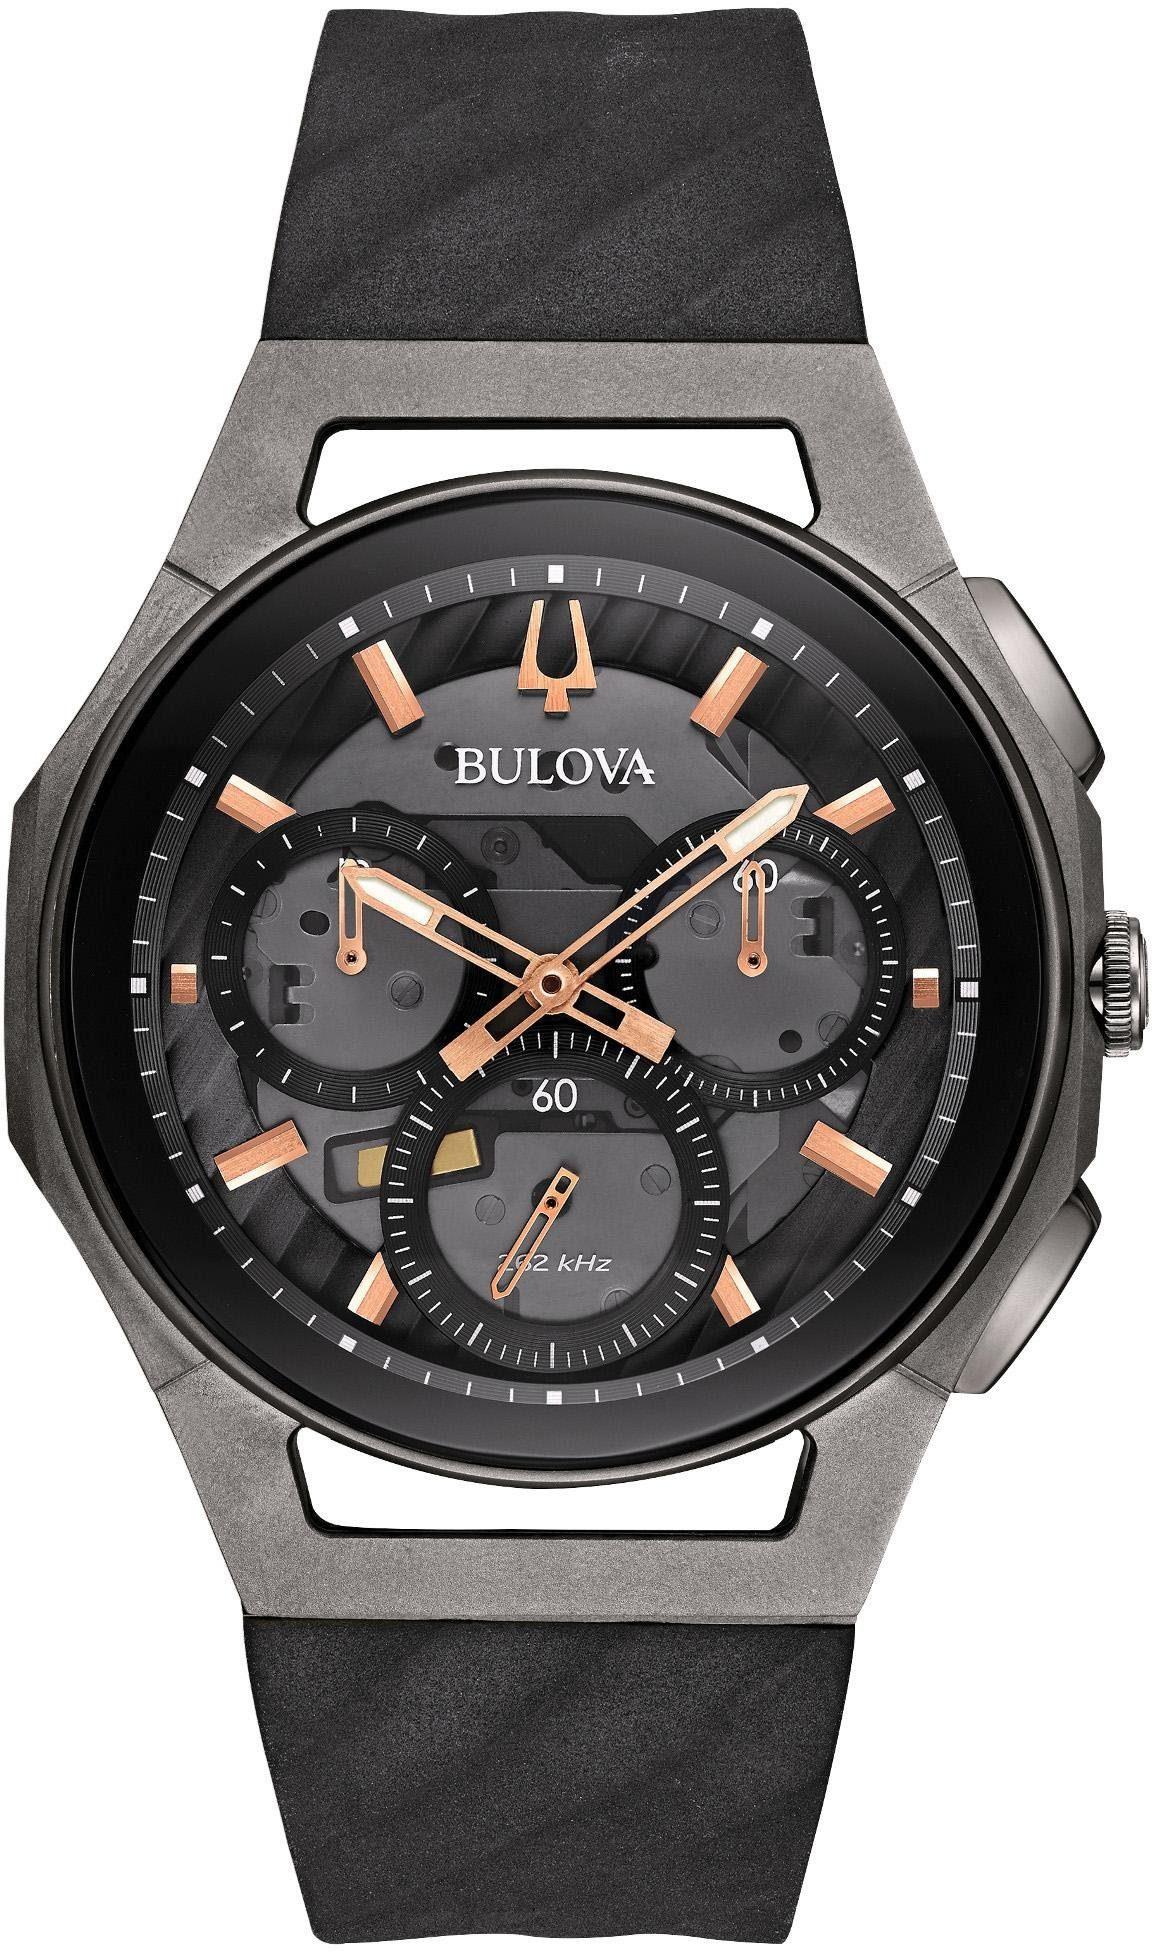 Bulova Chronograph »98A162«